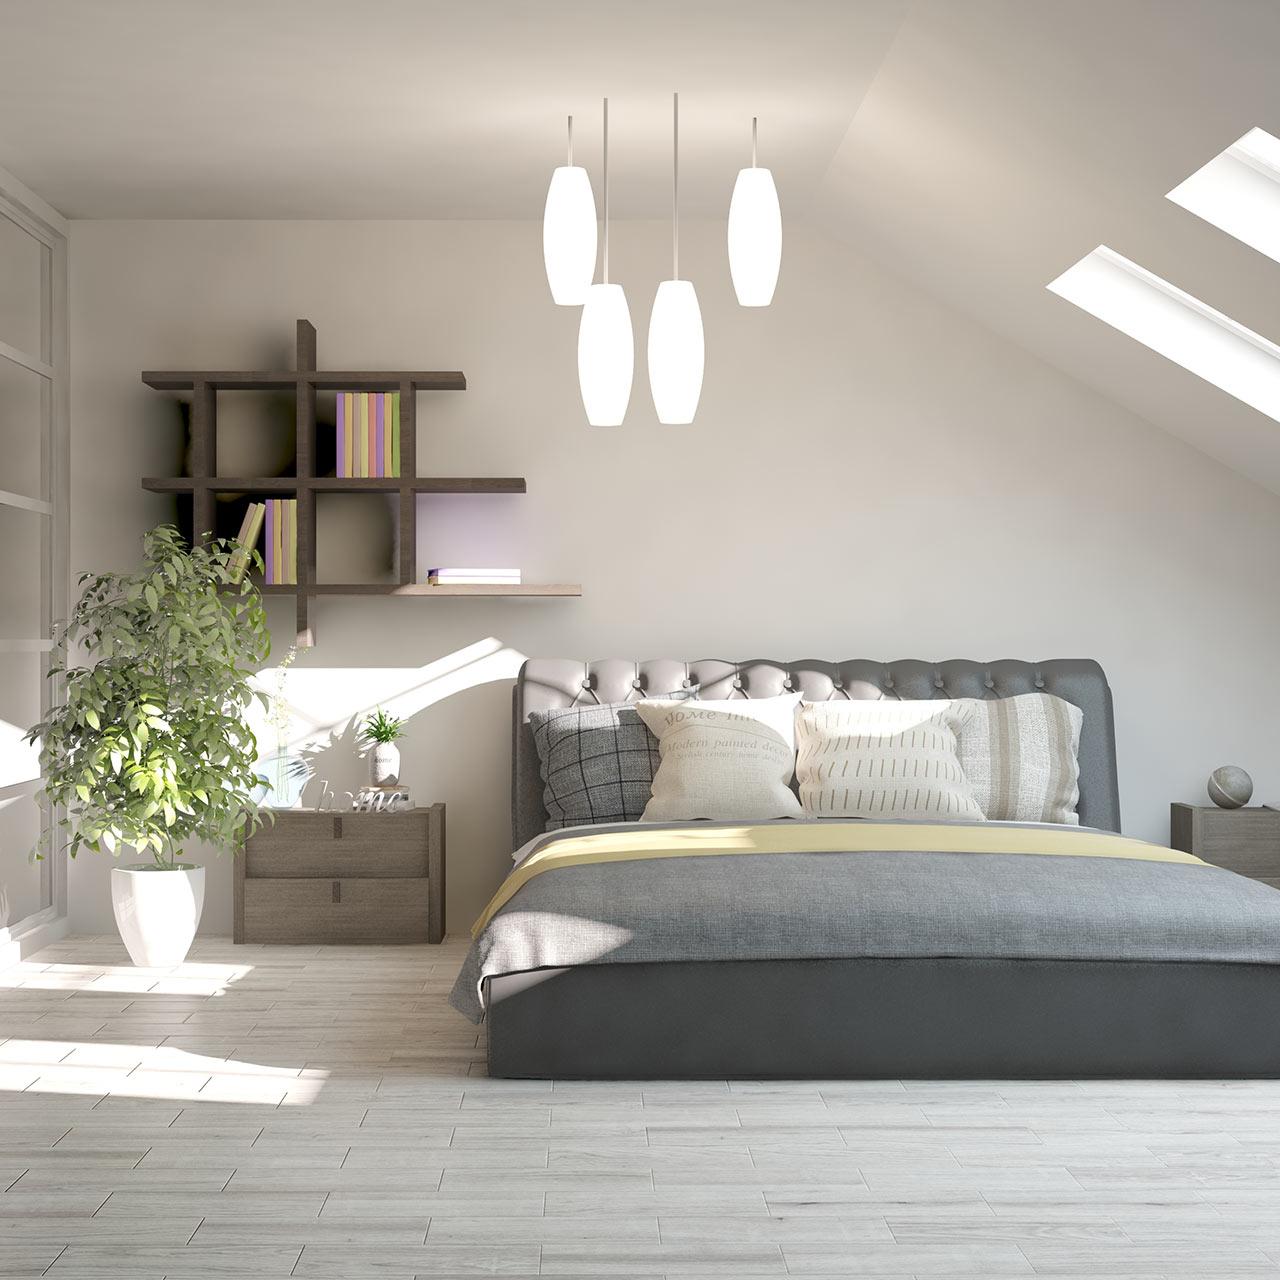 Furniture Ideas for Scanadivian Style Bedroom Design